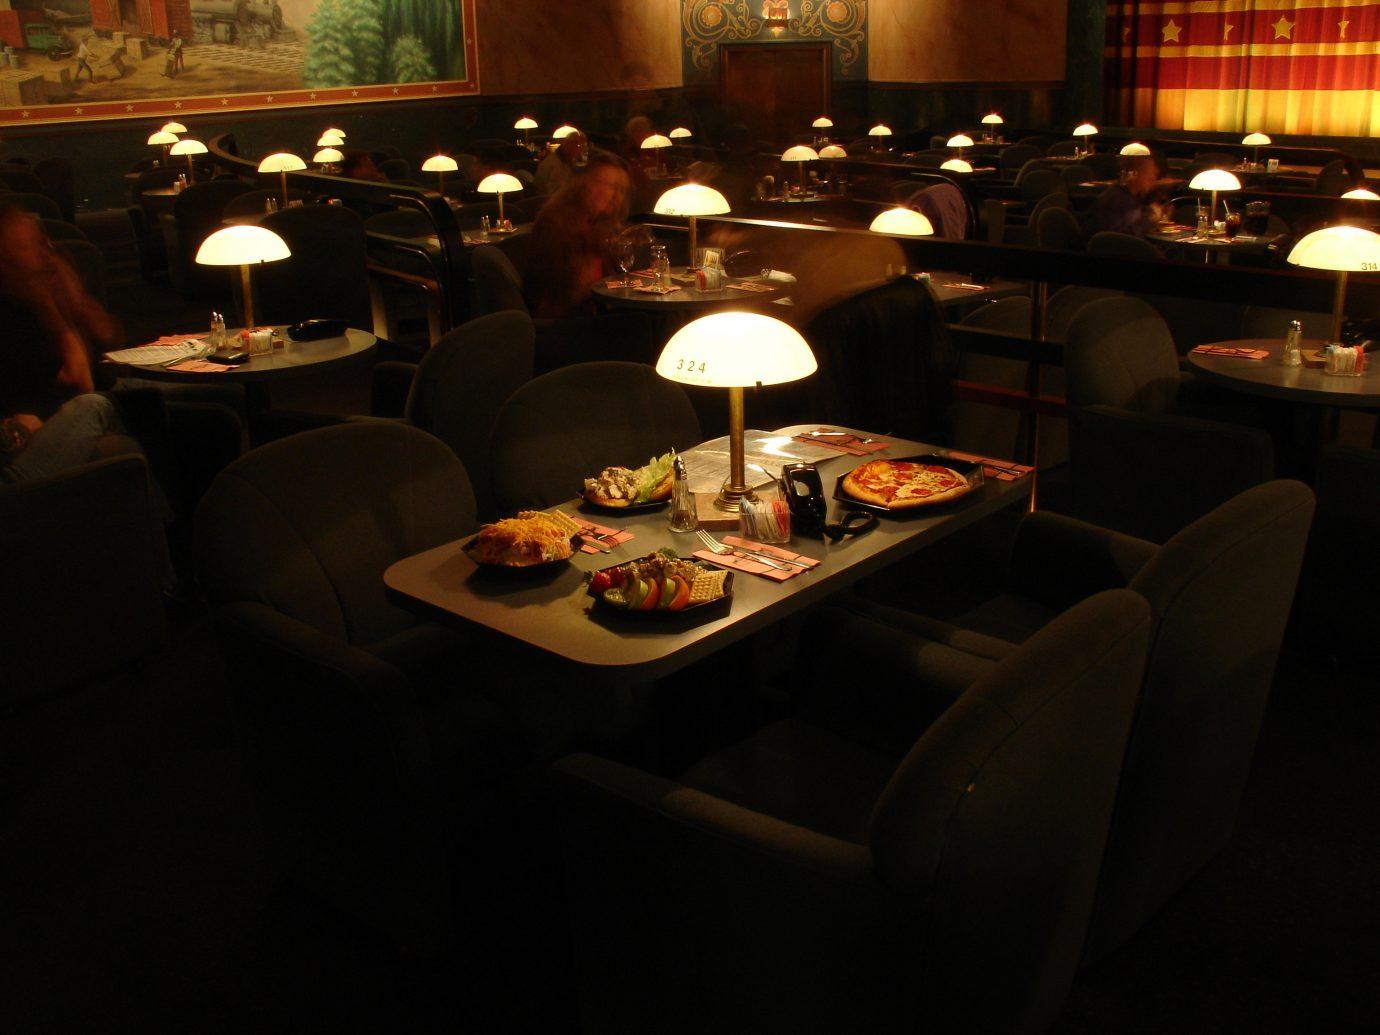 Arts + Culture table indoor restaurant meal room Bar dinner set